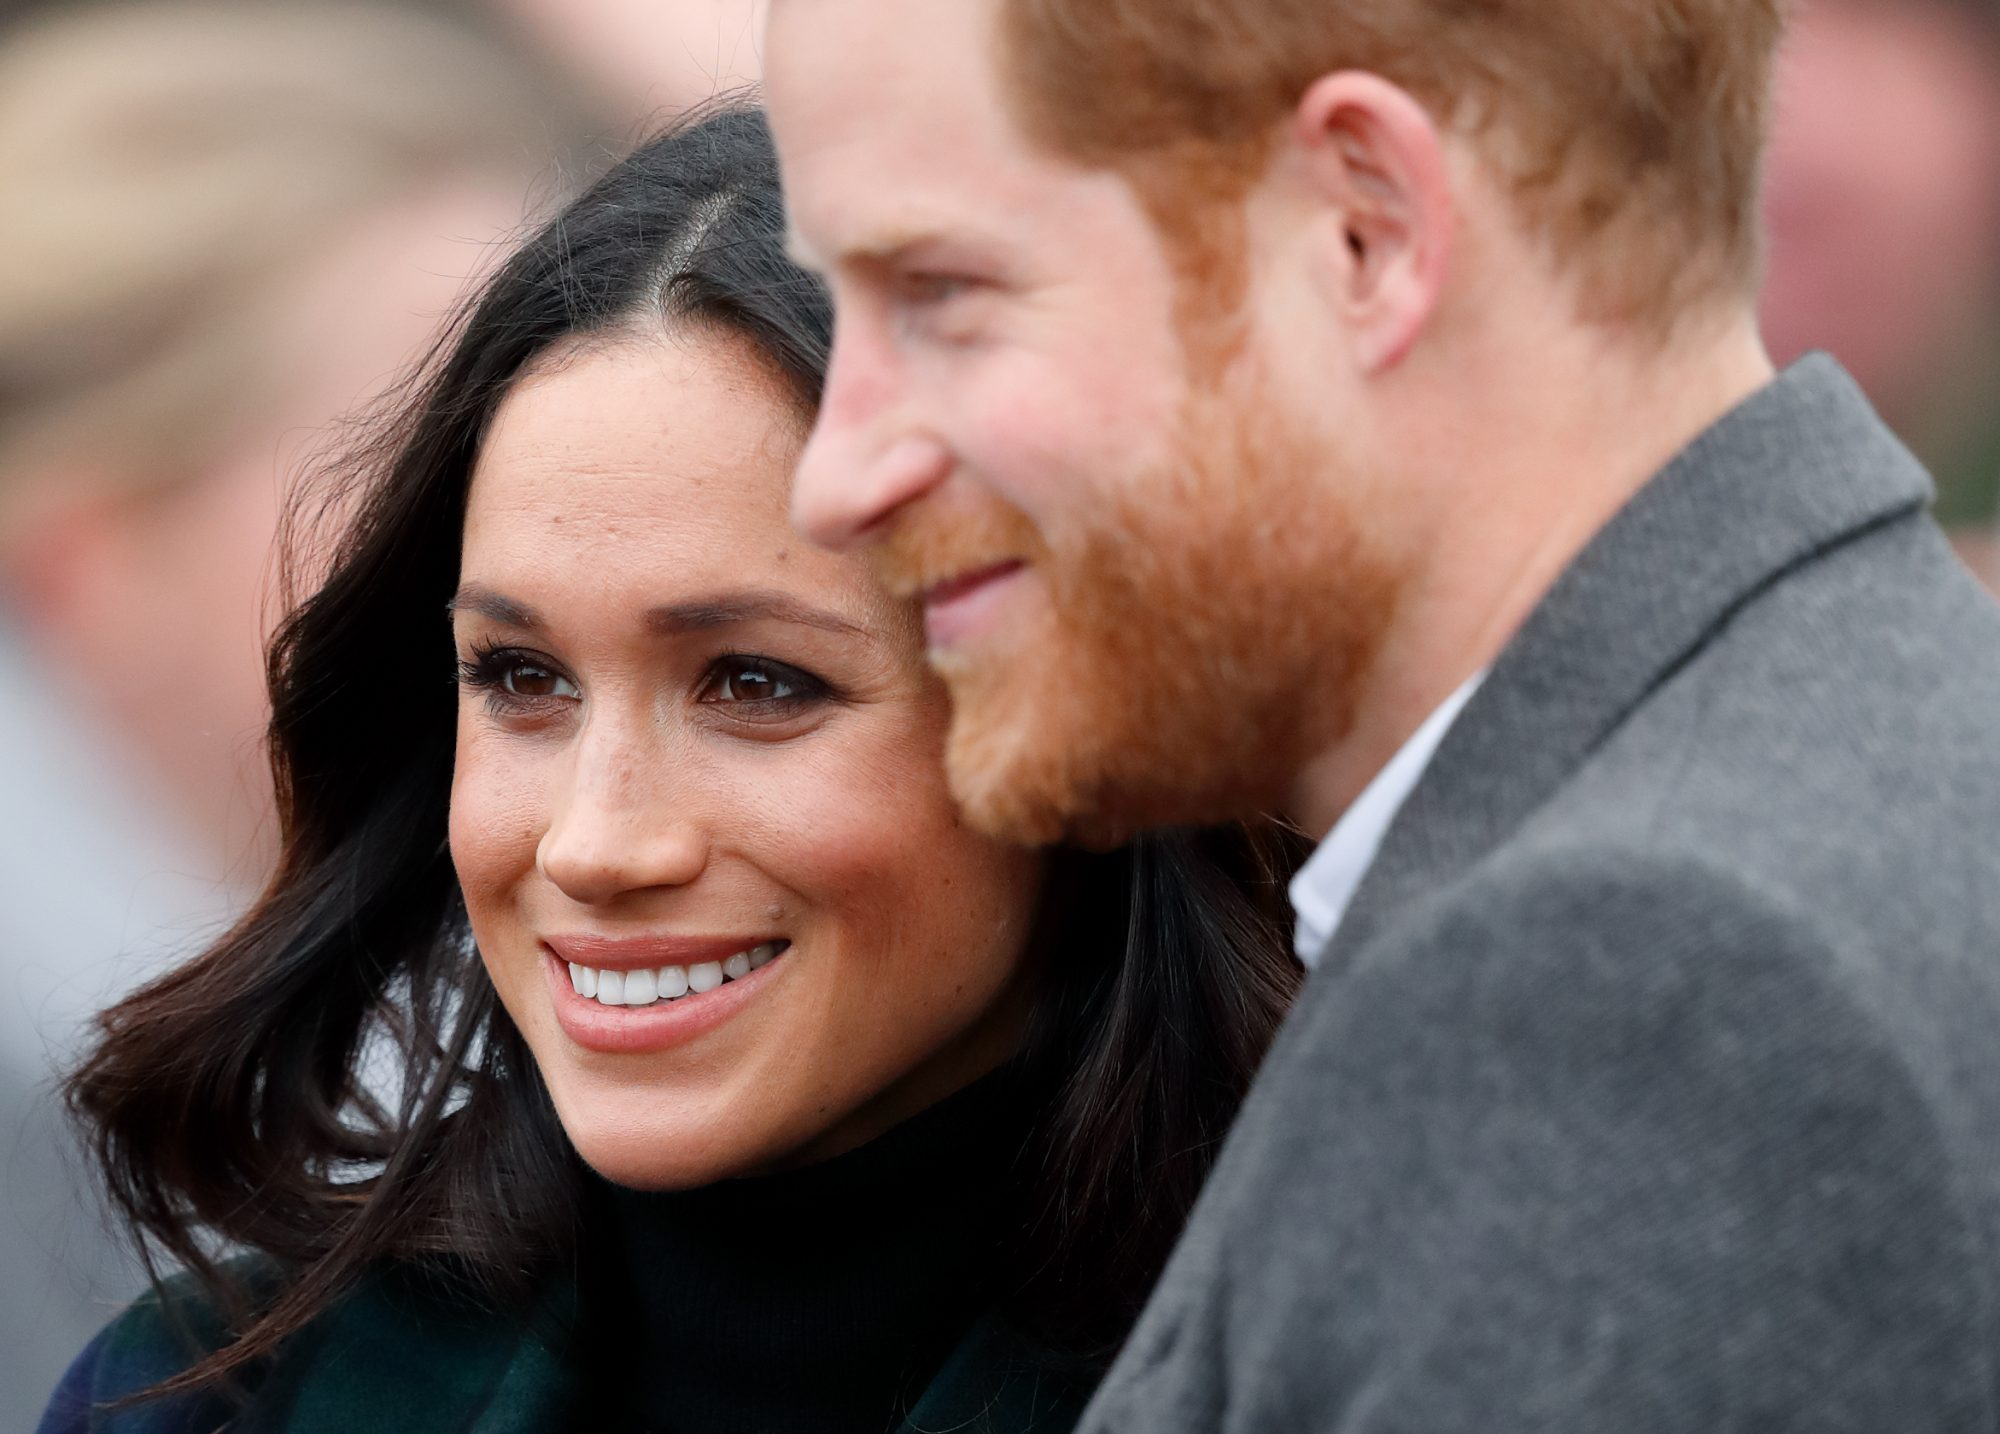 Photo of Royal Wedding Couple Meghan Markle and Prince Harry